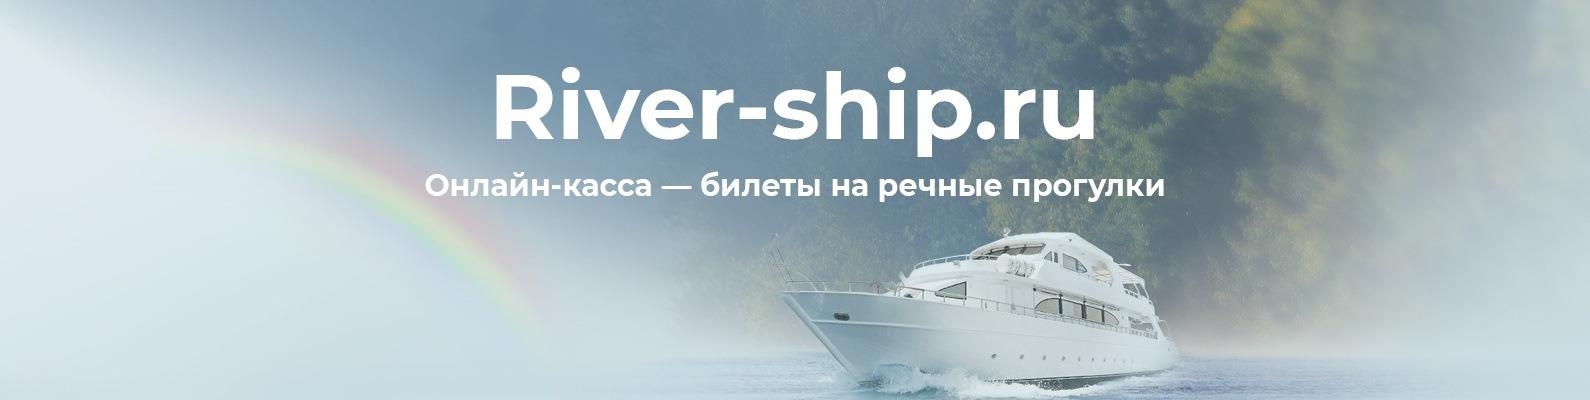 River-ship